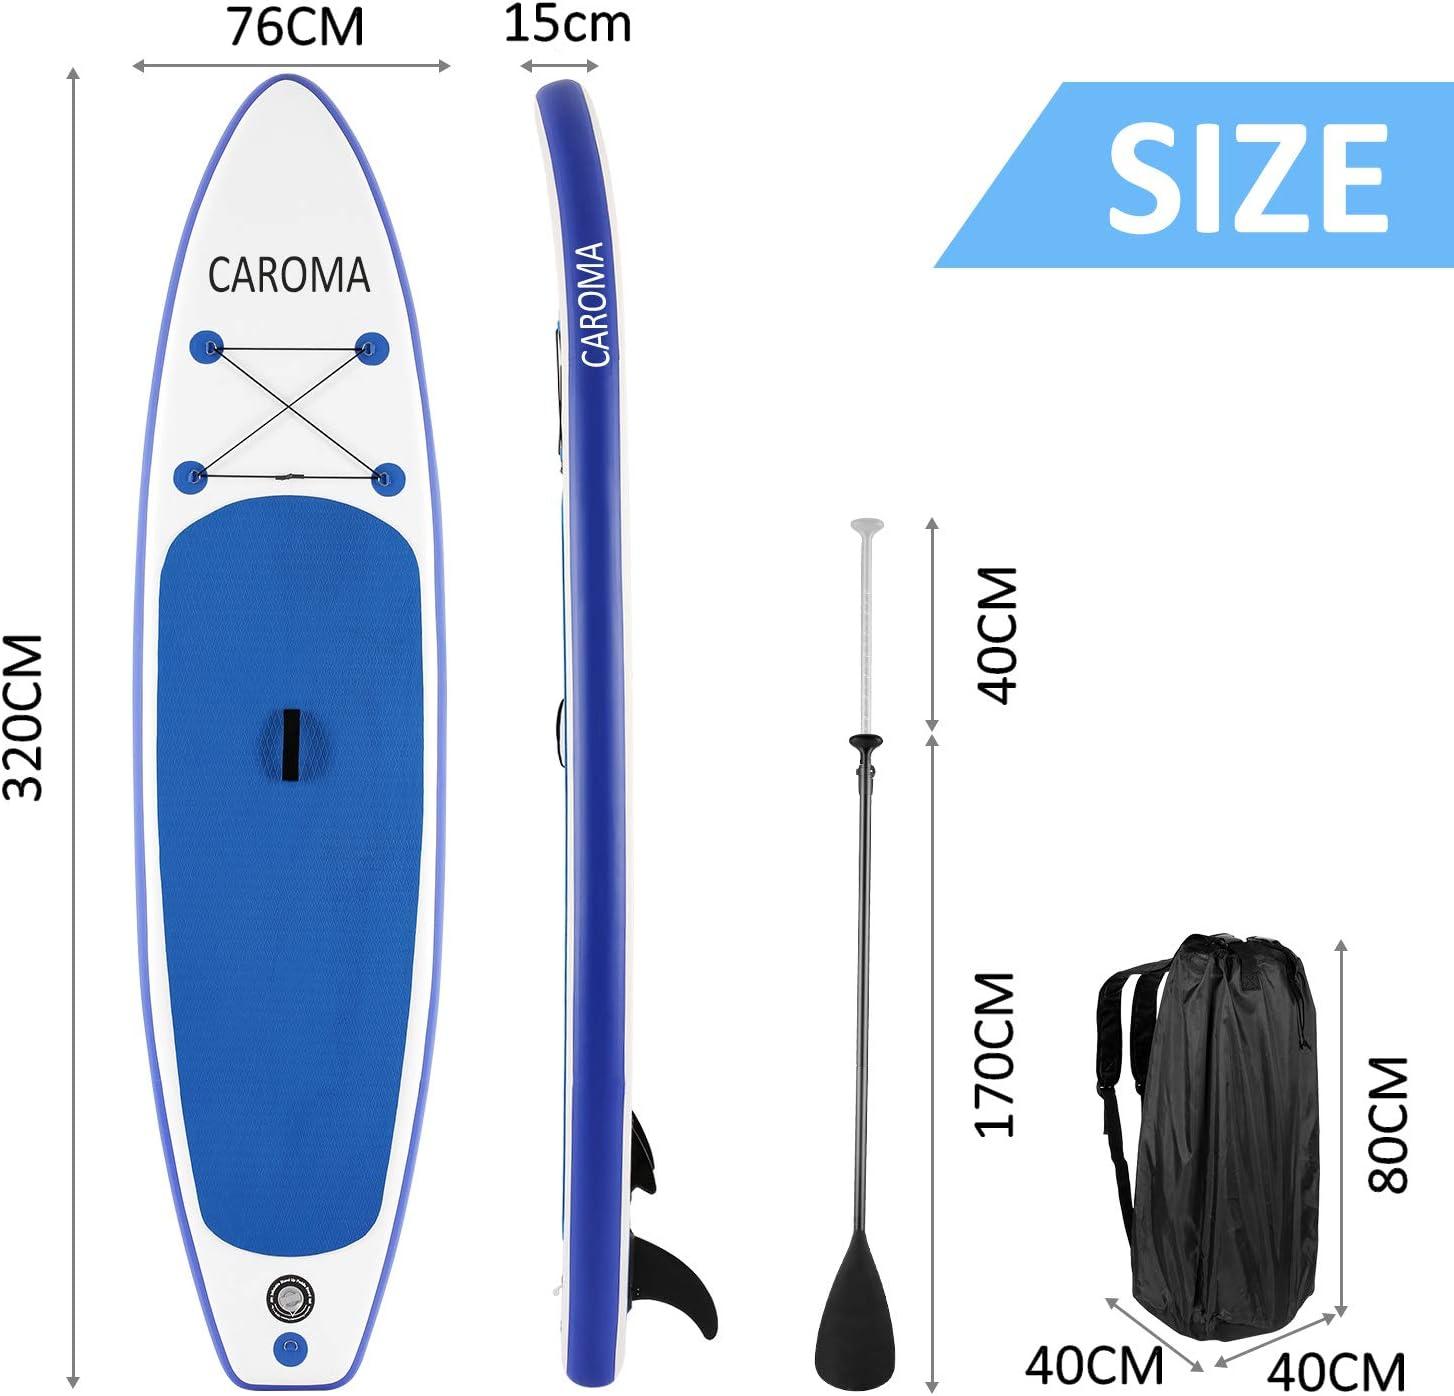 correa de seguridad para el tobillo Caroma mochila de transporte pala ajustable bomba manual 27 cm de largo Kit de surf de pala inflable de alta calidad de SUP 15,24 cm de grosor